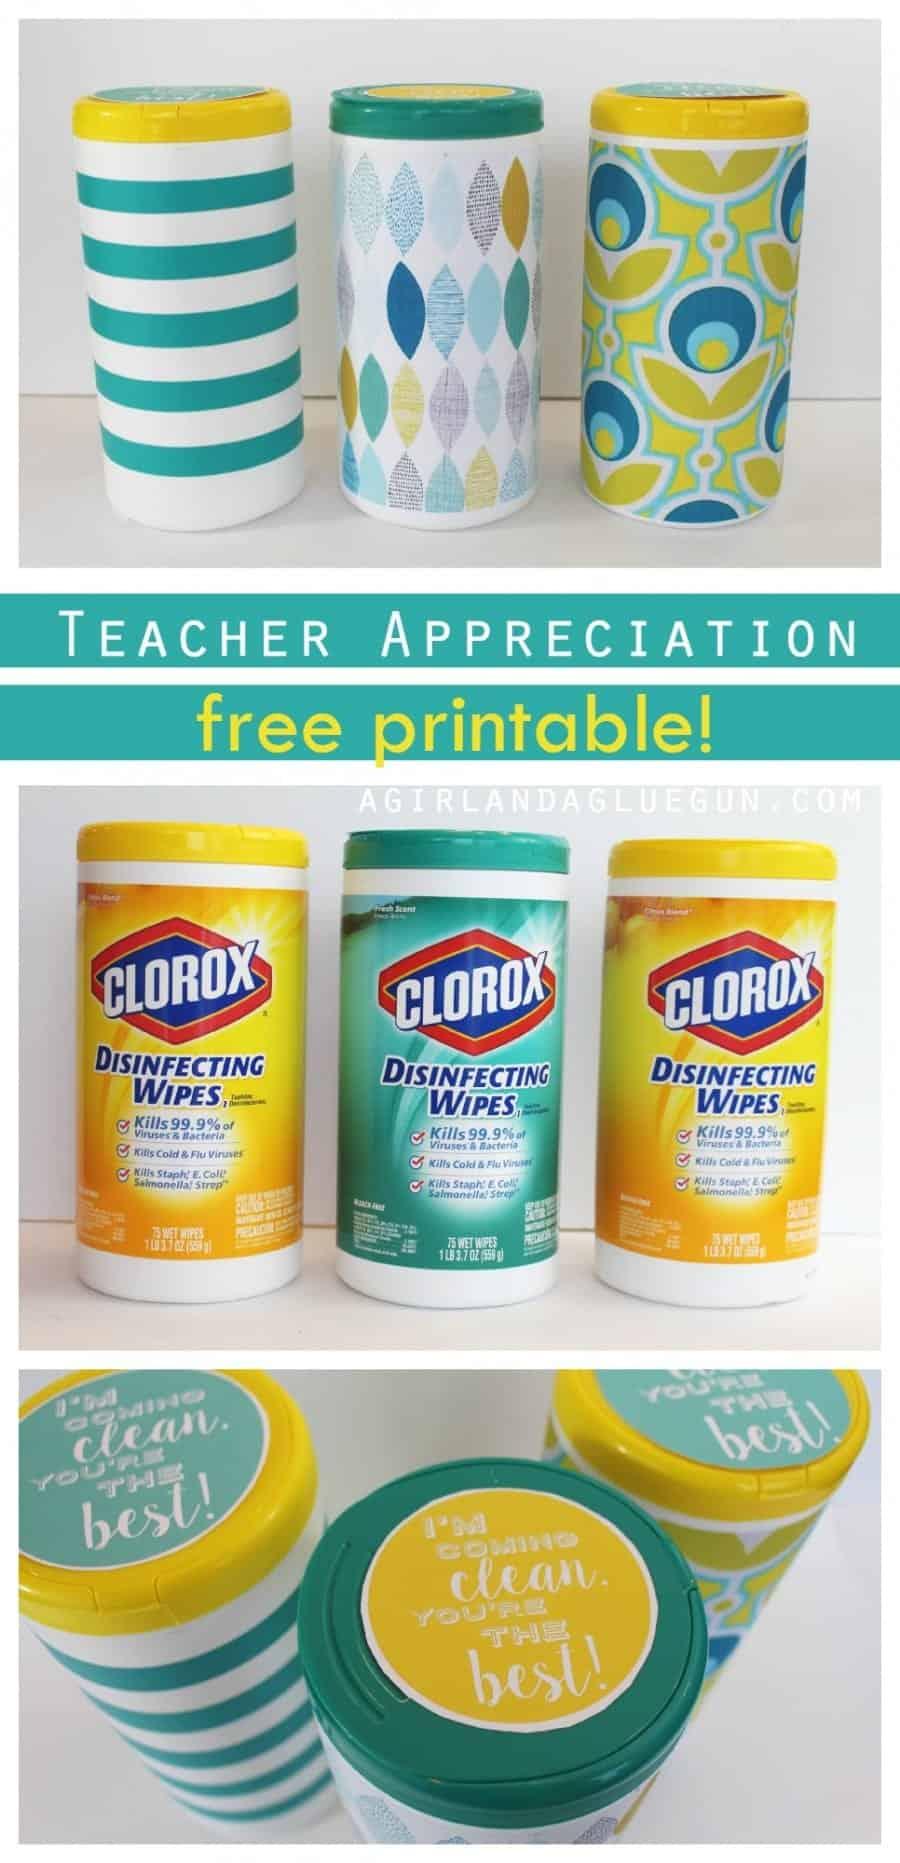 teacher appreciation free printable gift